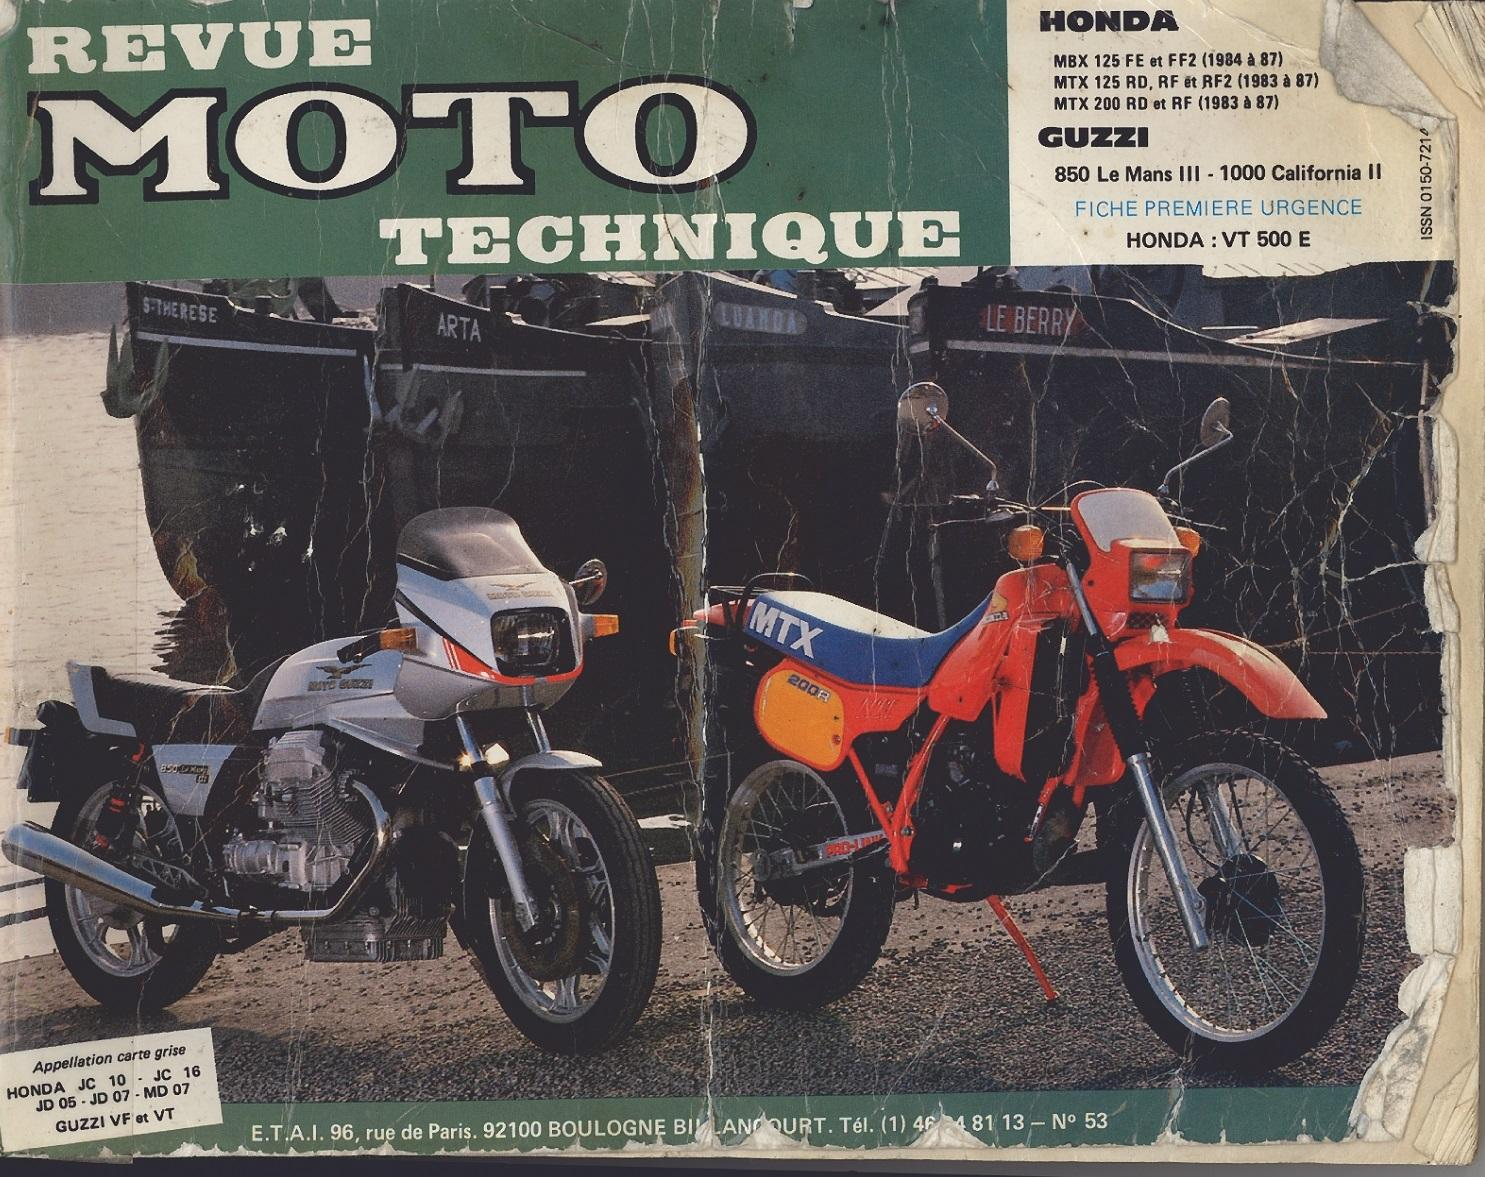 Workshop Manual for Honda MTX200RF (1983-1987)